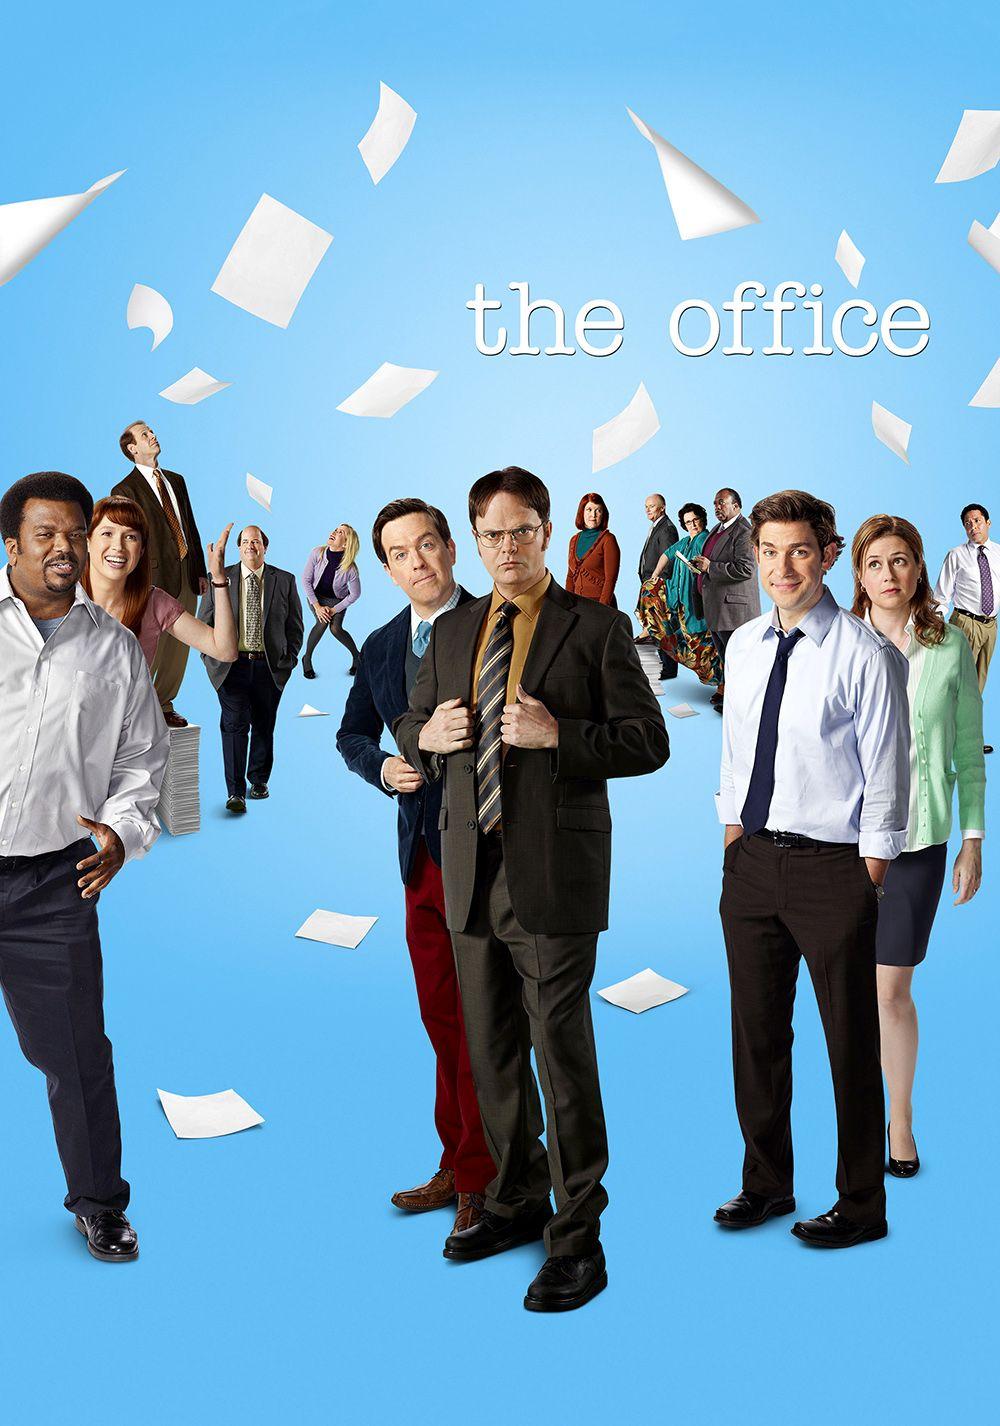 the office season 4 free online